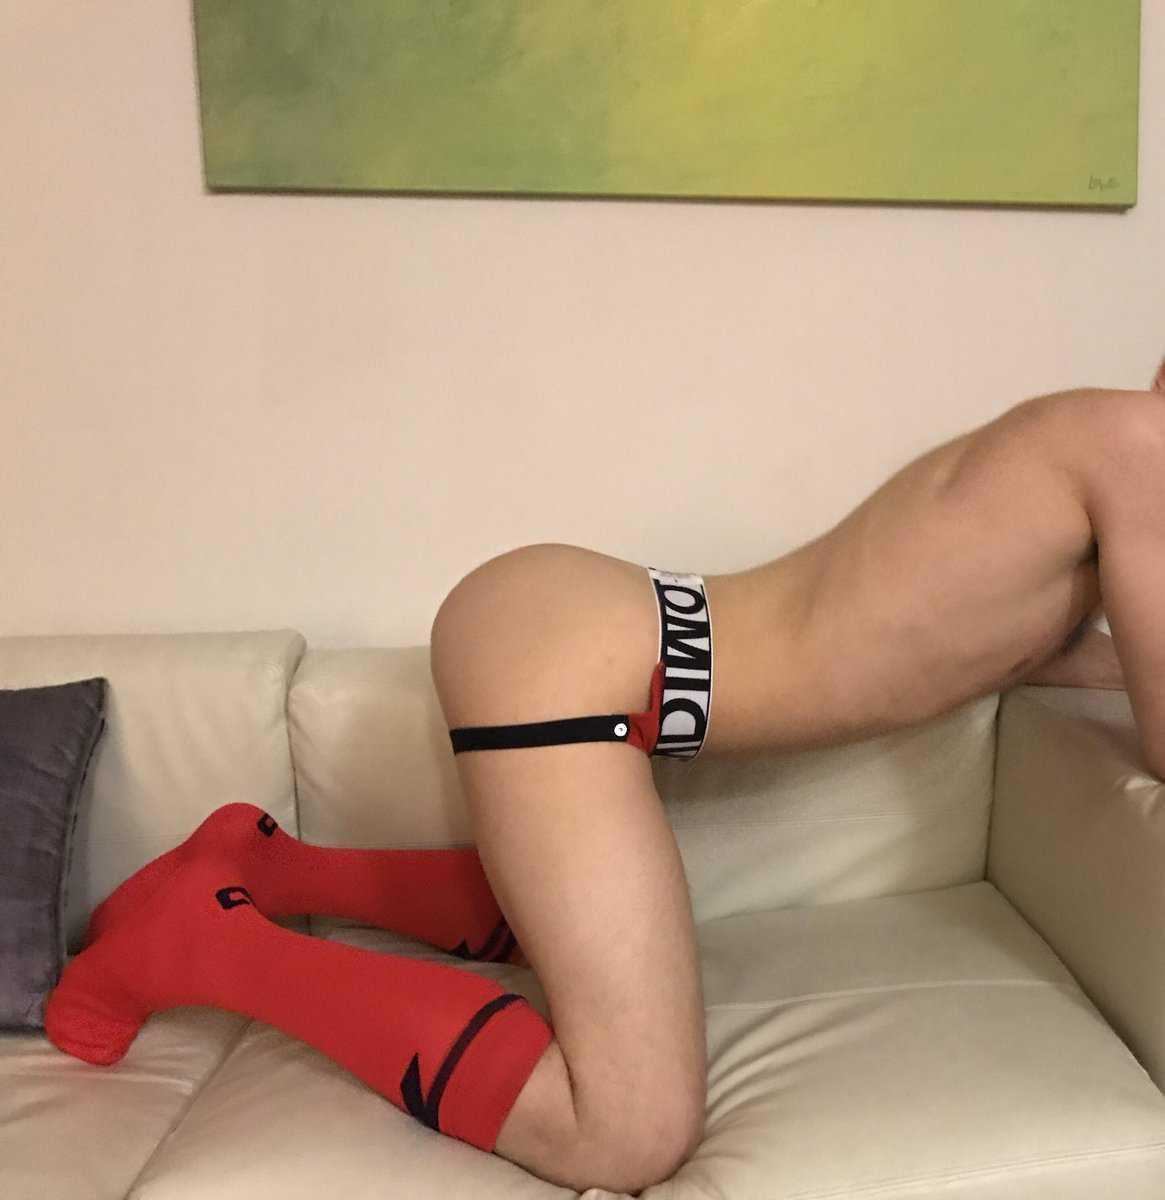 gay video in italiano escort gay abruzzo